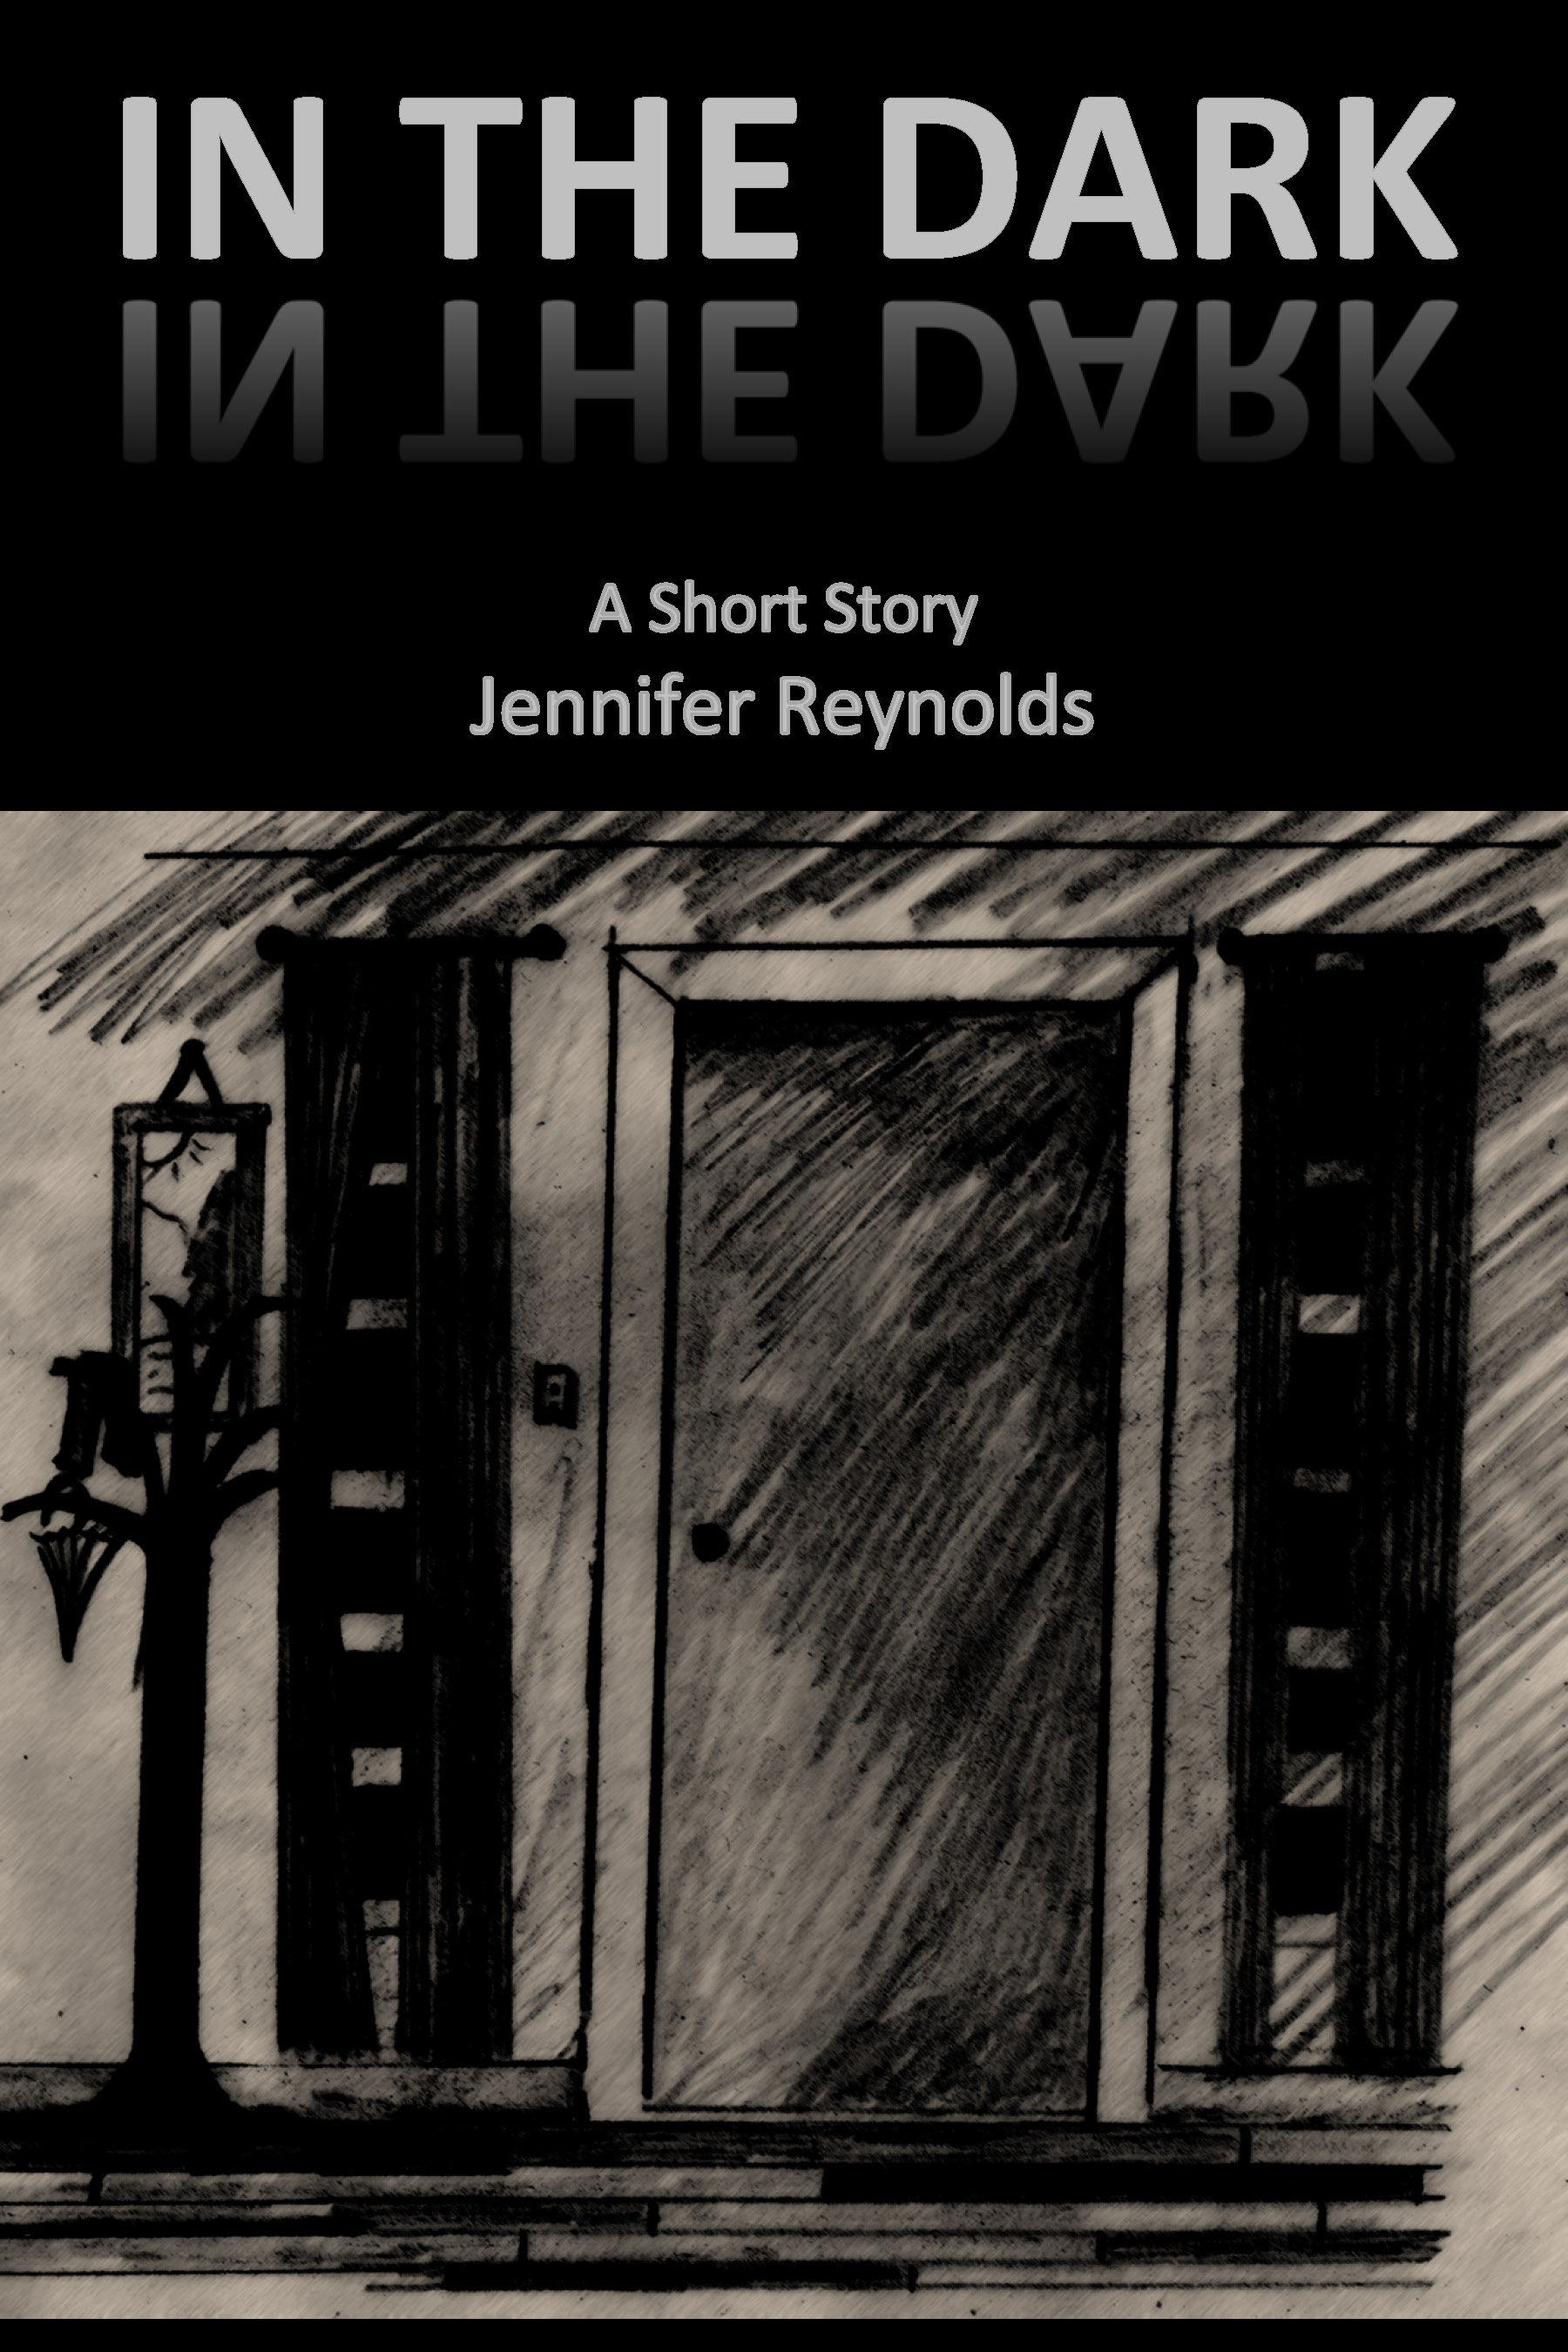 https://www.goodreads.com/story/show/375597-in-the-dark  https://www.goodreads.com/book/show/23358309-in-the-dark   https://www.smashwords.com/books/view/487854